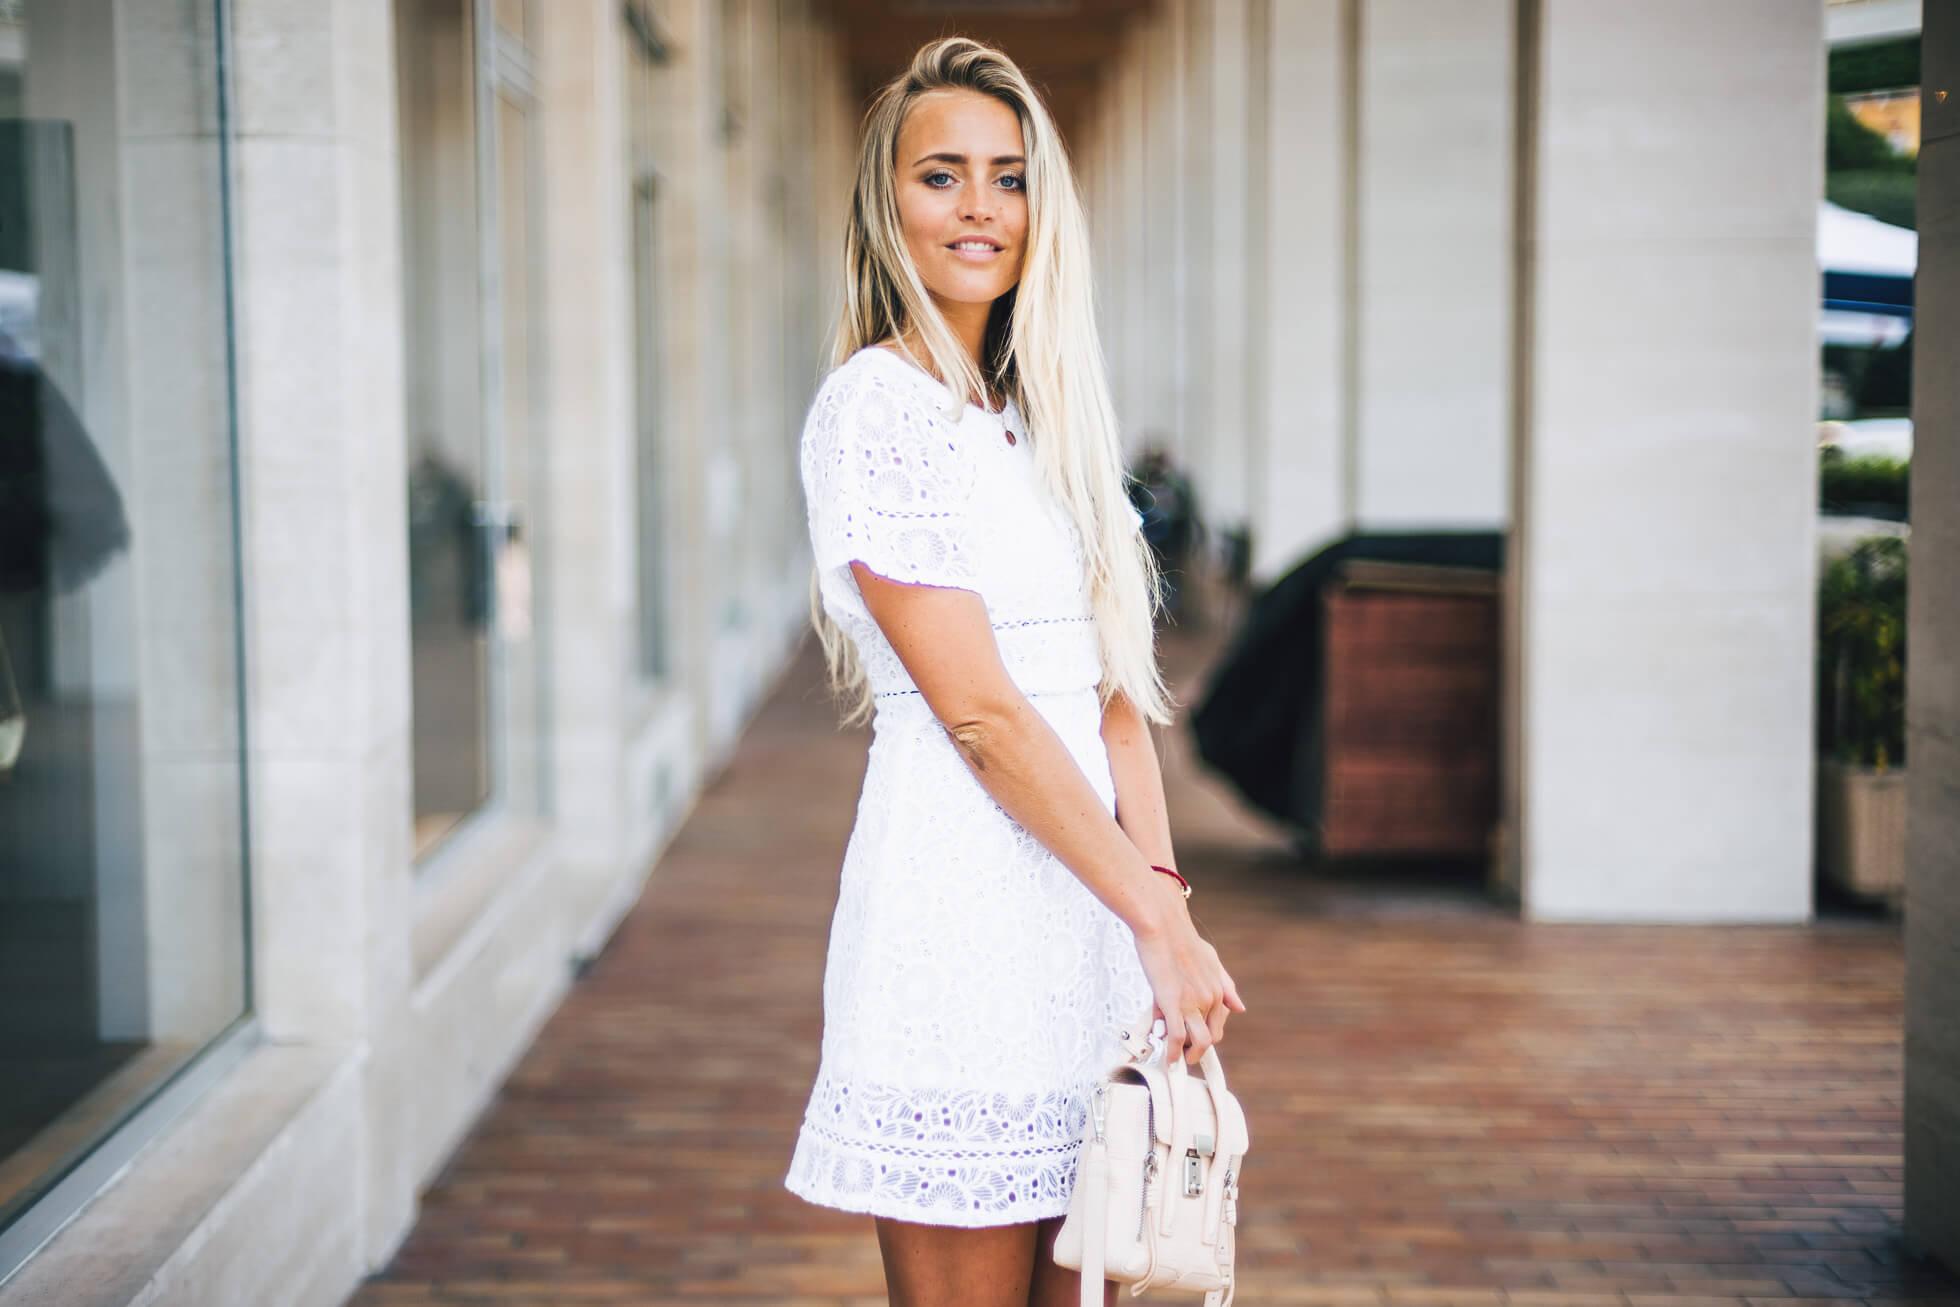 janni-deler-white-lace-dress-storetsJ1040114-Redigera